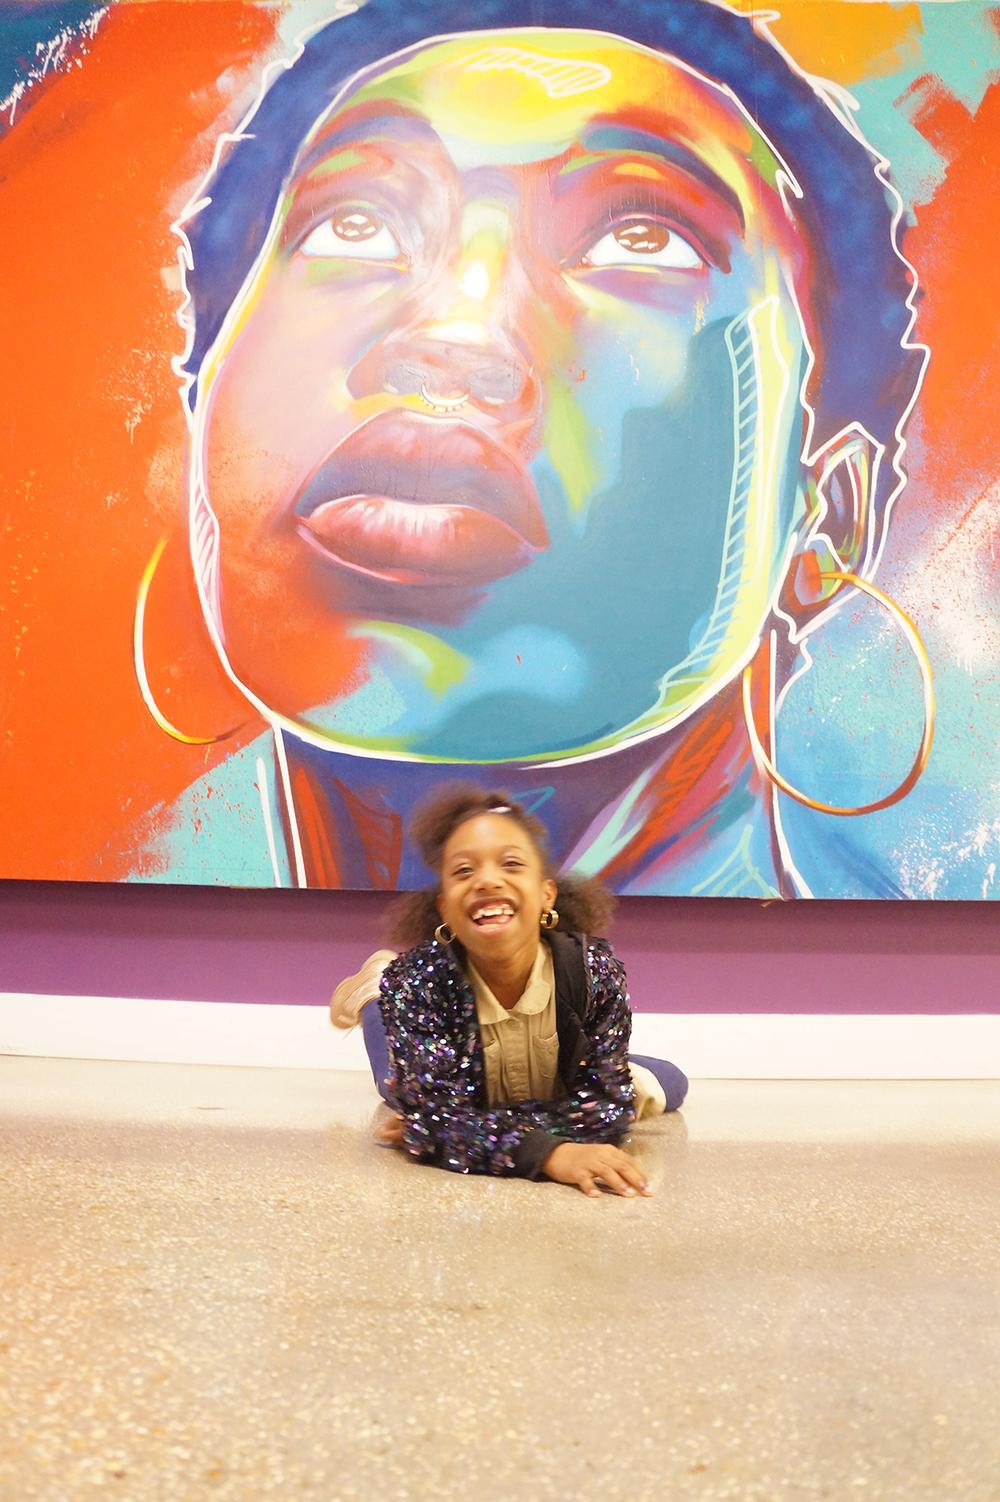 Andrea Fenise Memphis Fashion Blogger shares a MLK and Motherhood post